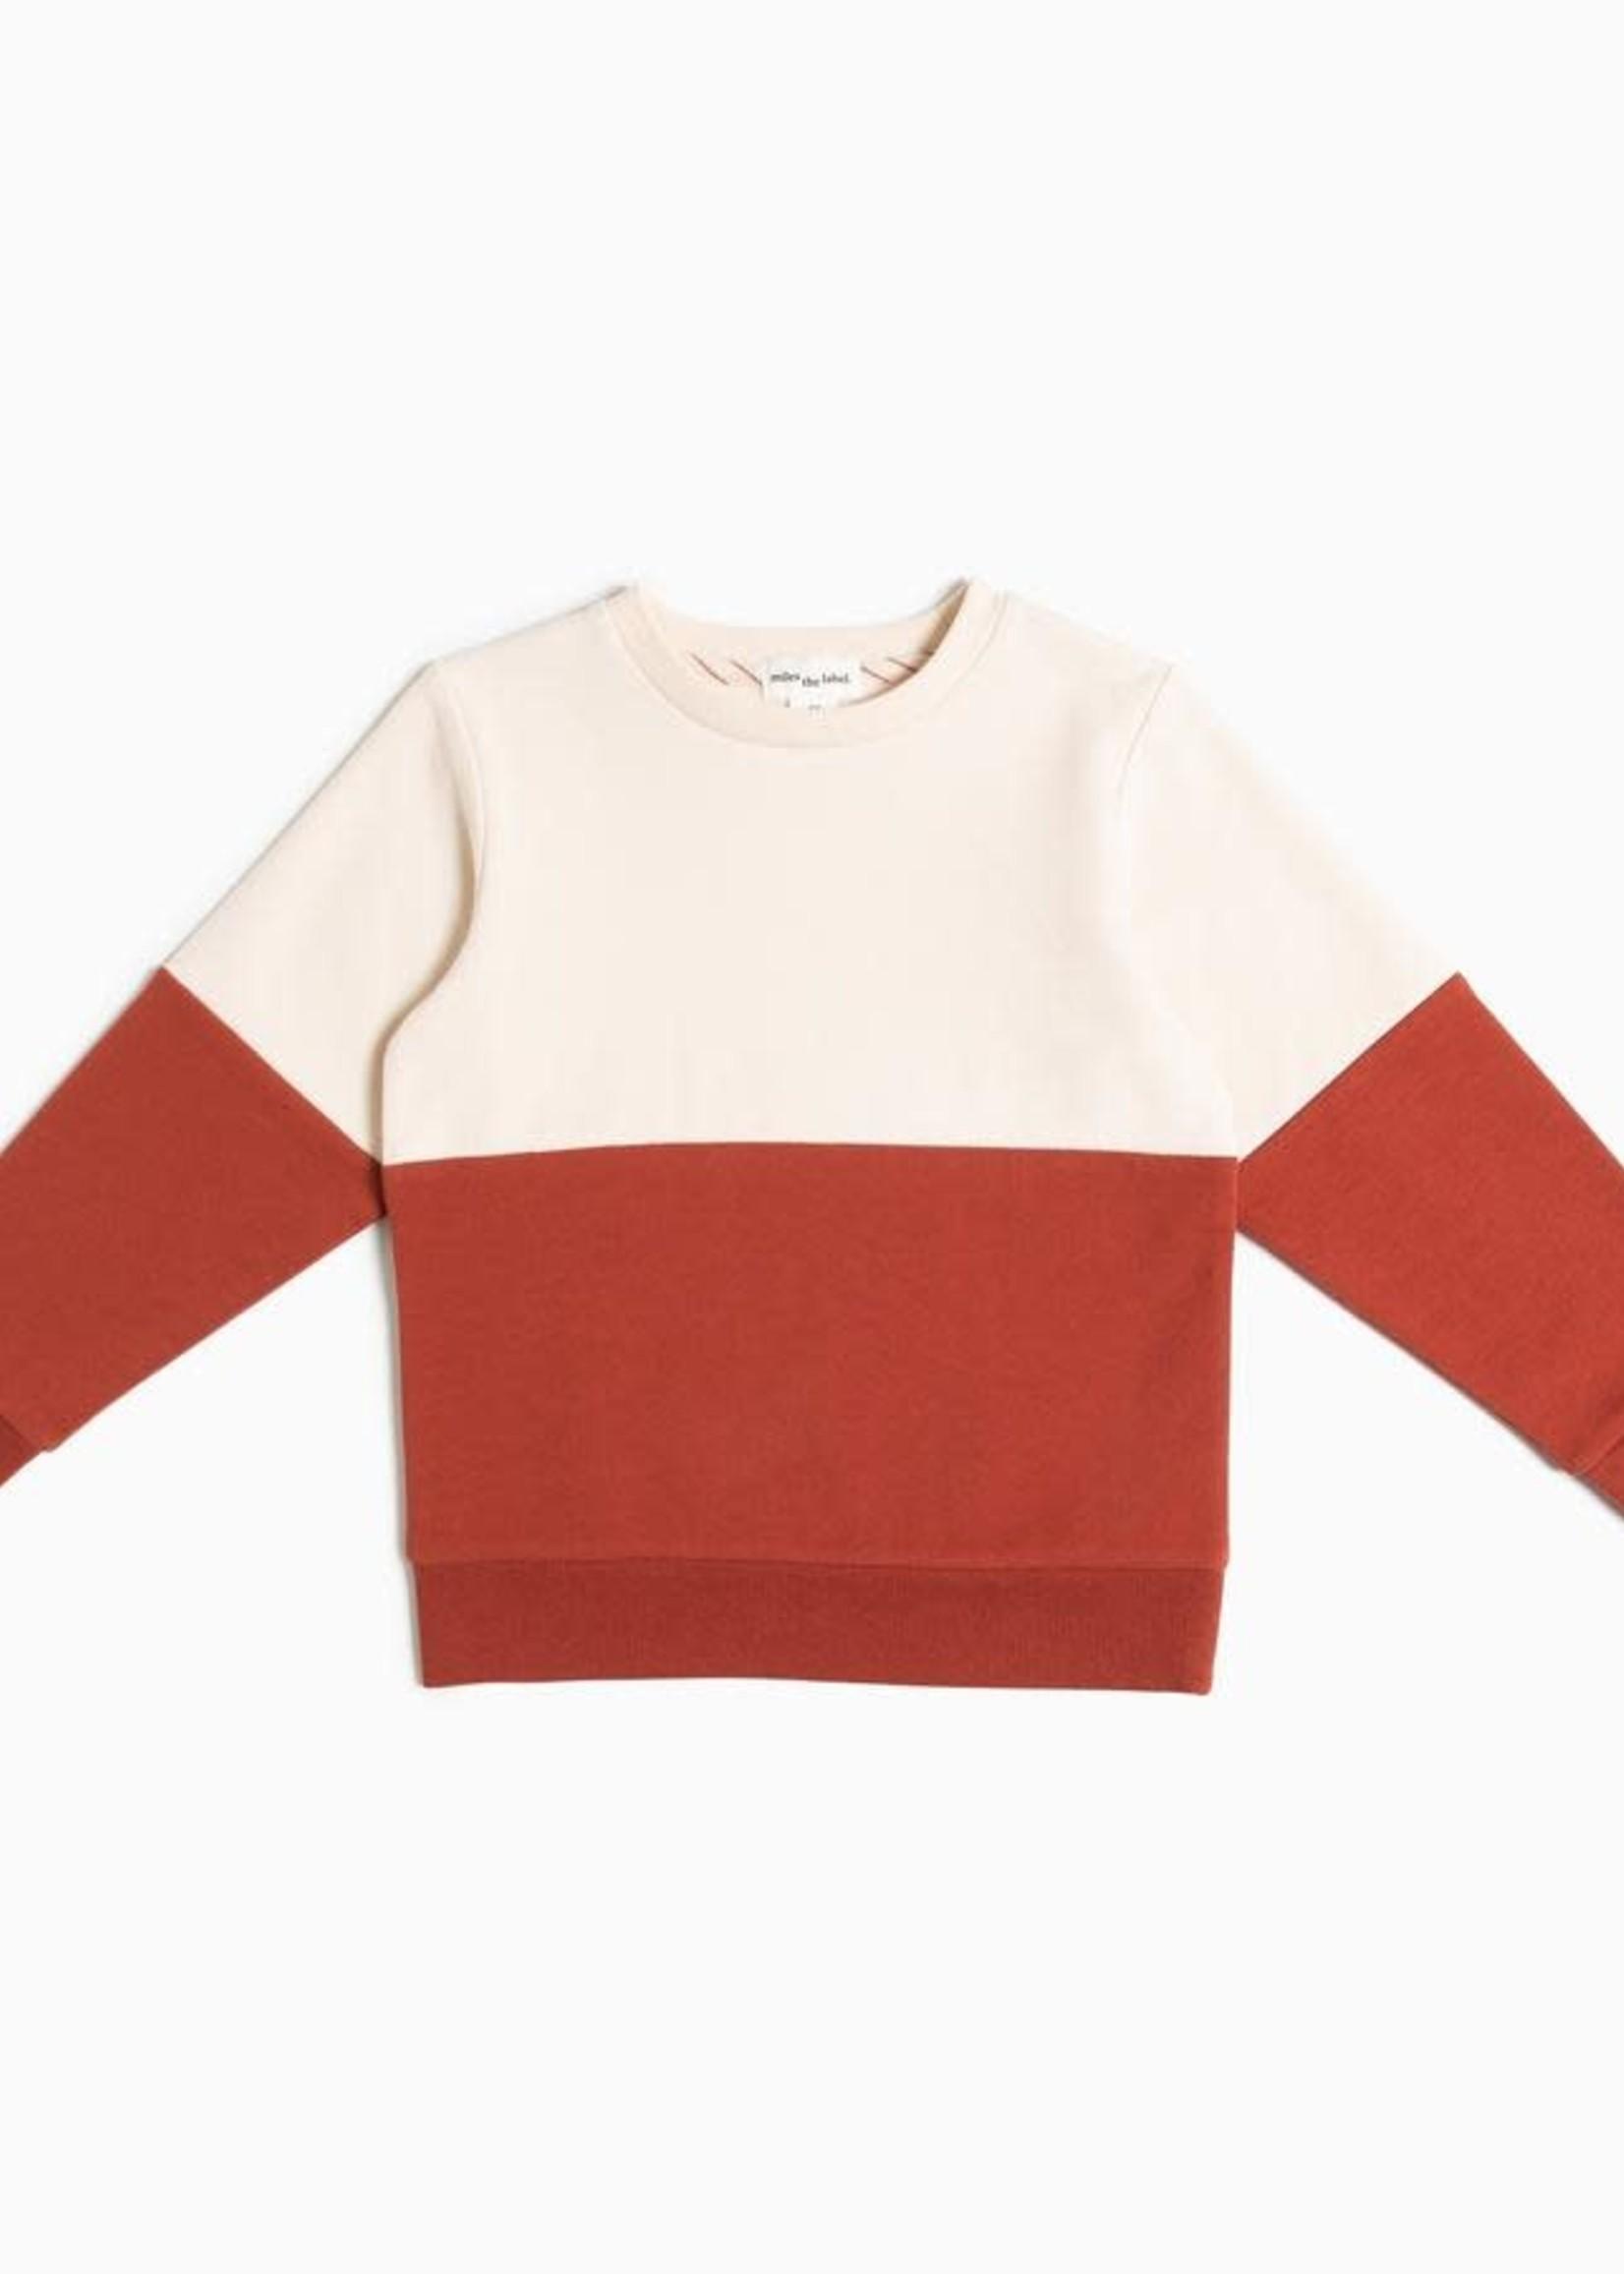 miles the label MB Tapioca/Henna Orange Colorblock Sweater